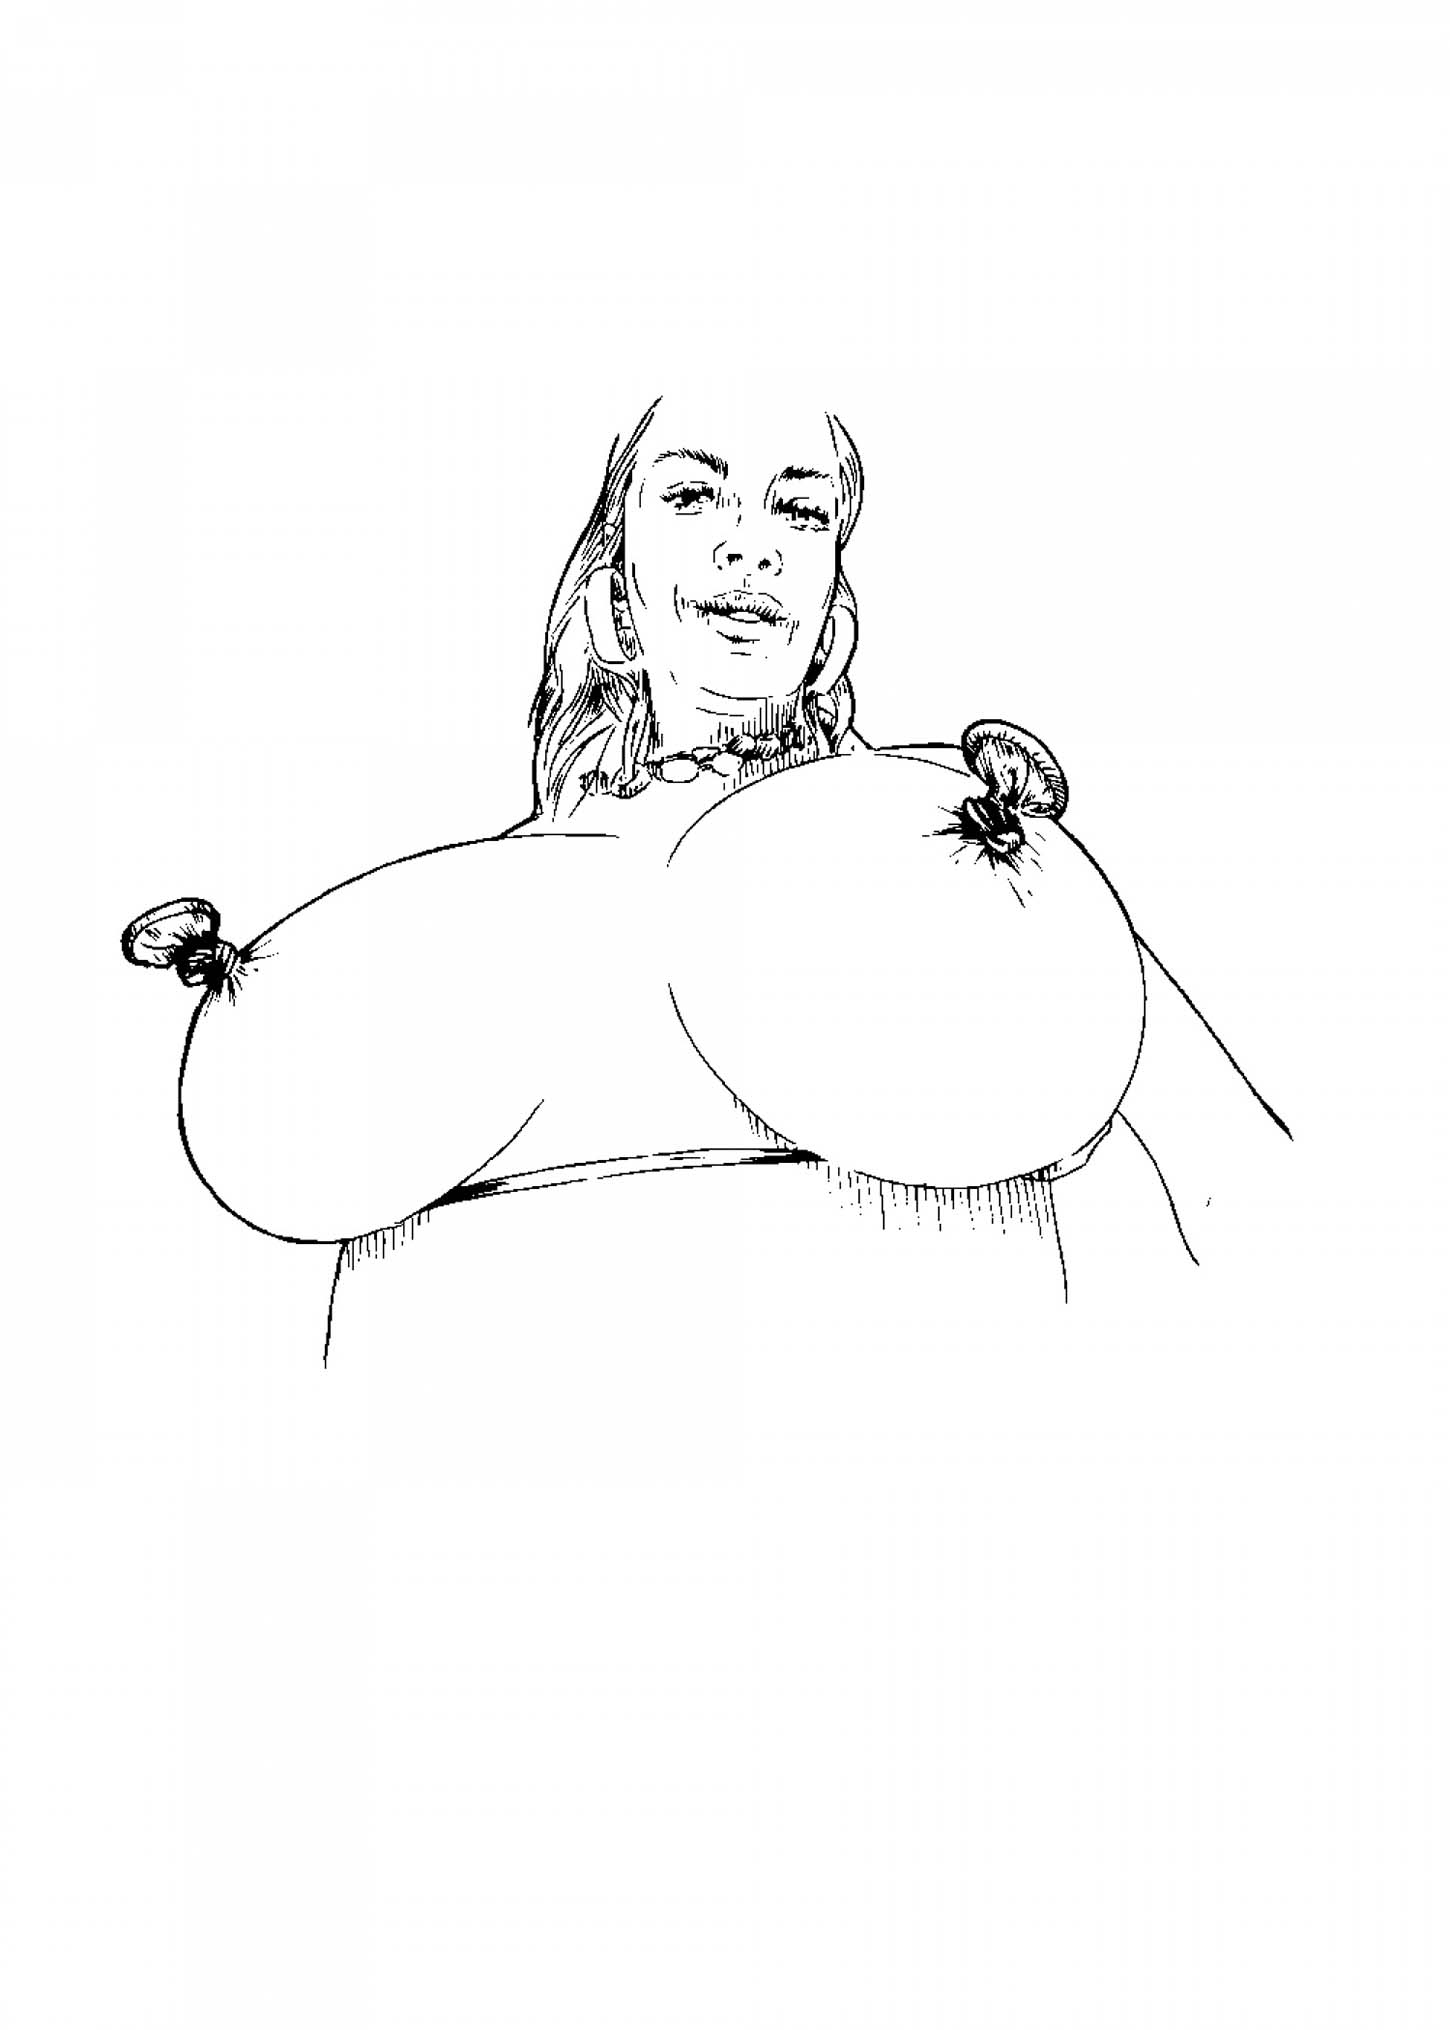 Han Hoogerbrugge, Sérigraphie, 70x50cm, 50 ex/brut de Centaure 300g. Disponible